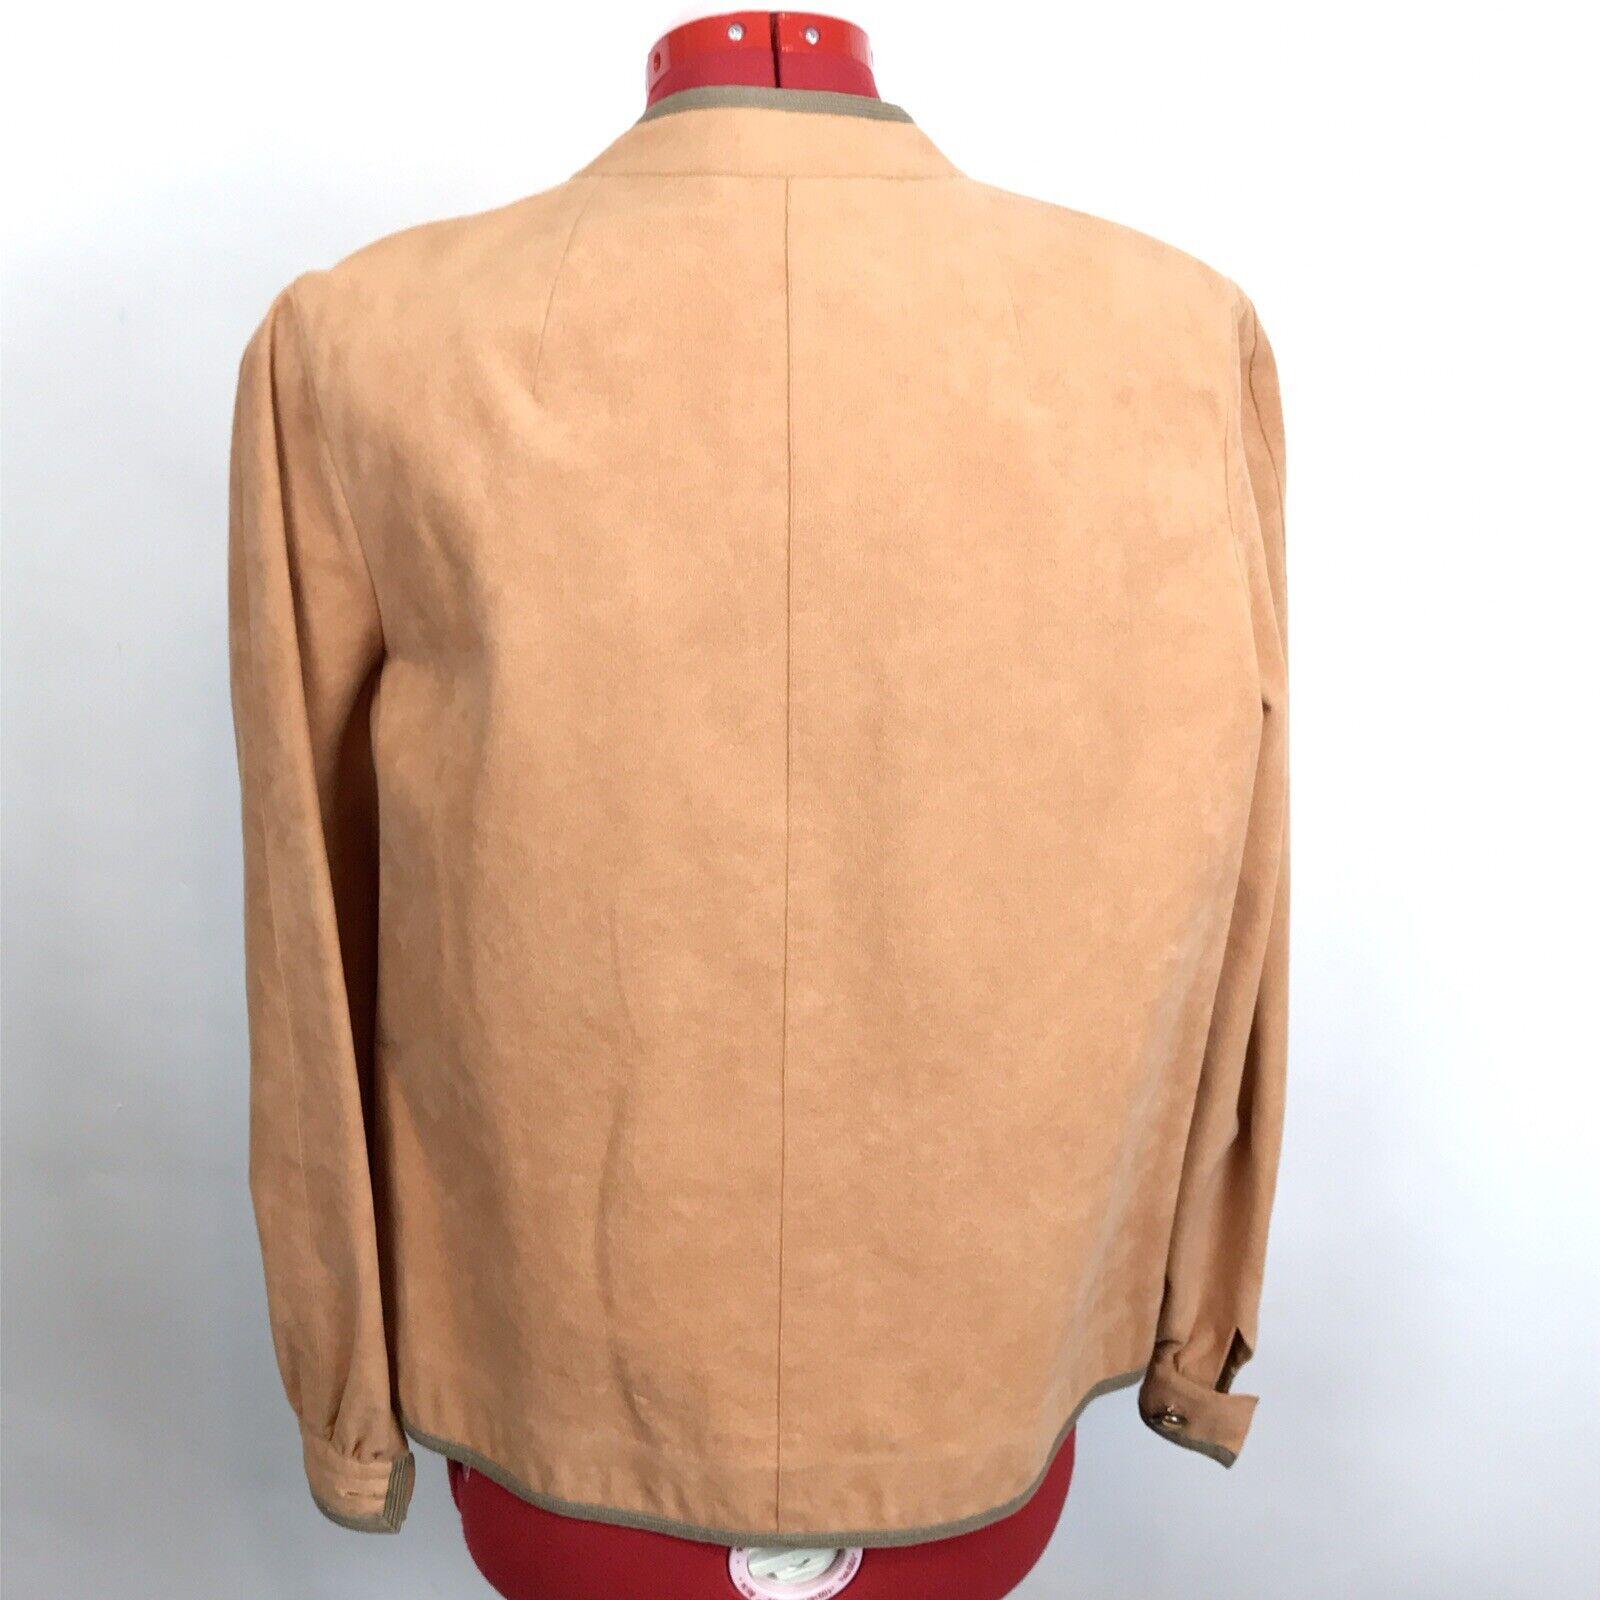 Vintage Retro 70s Mollie Parnis Ultra Suede Jacke… - image 6